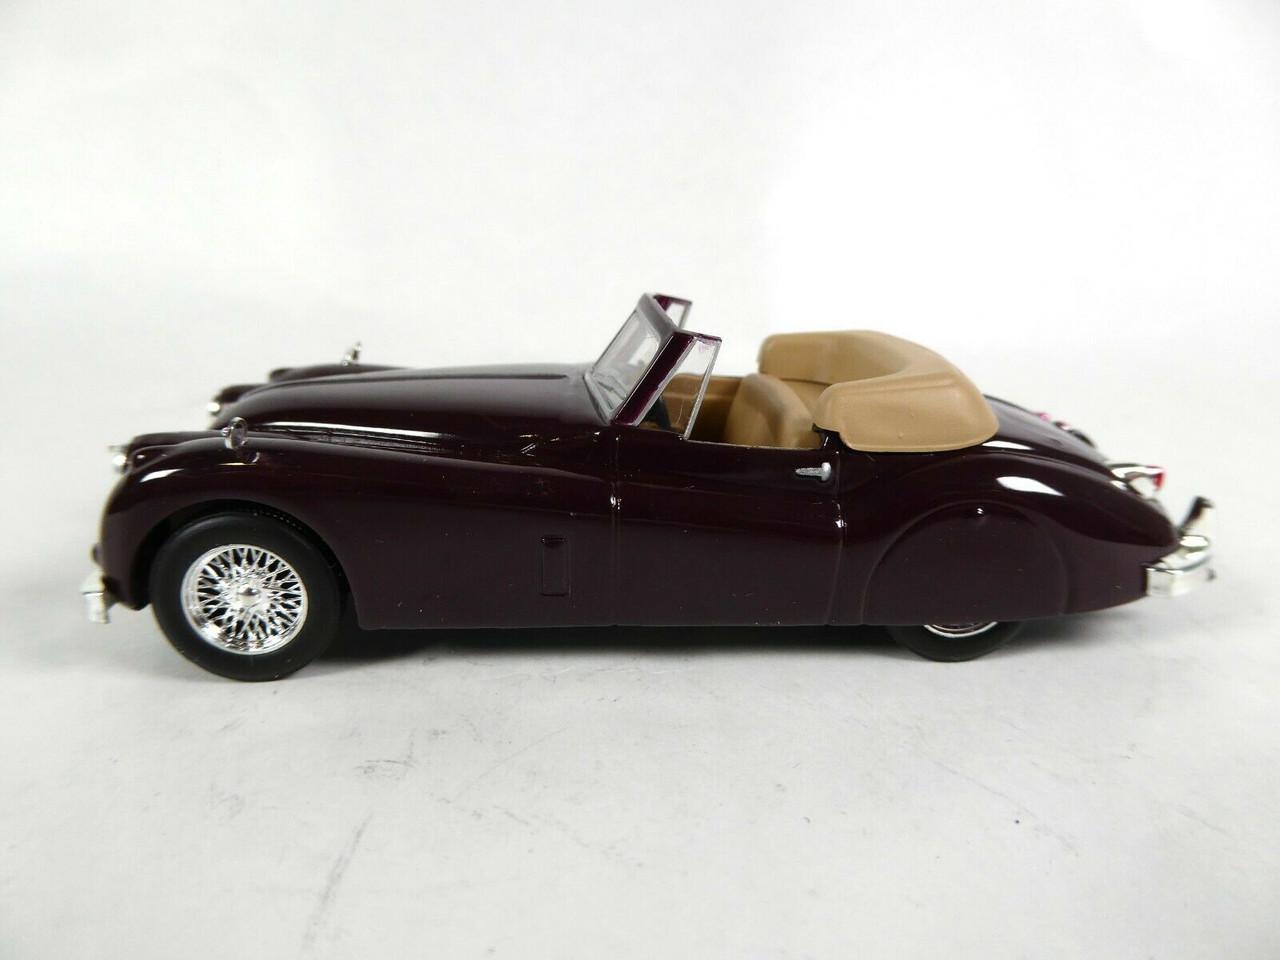 IXO DIECAST MODEL CAR Jaguar XK 140 Convertible 1:43